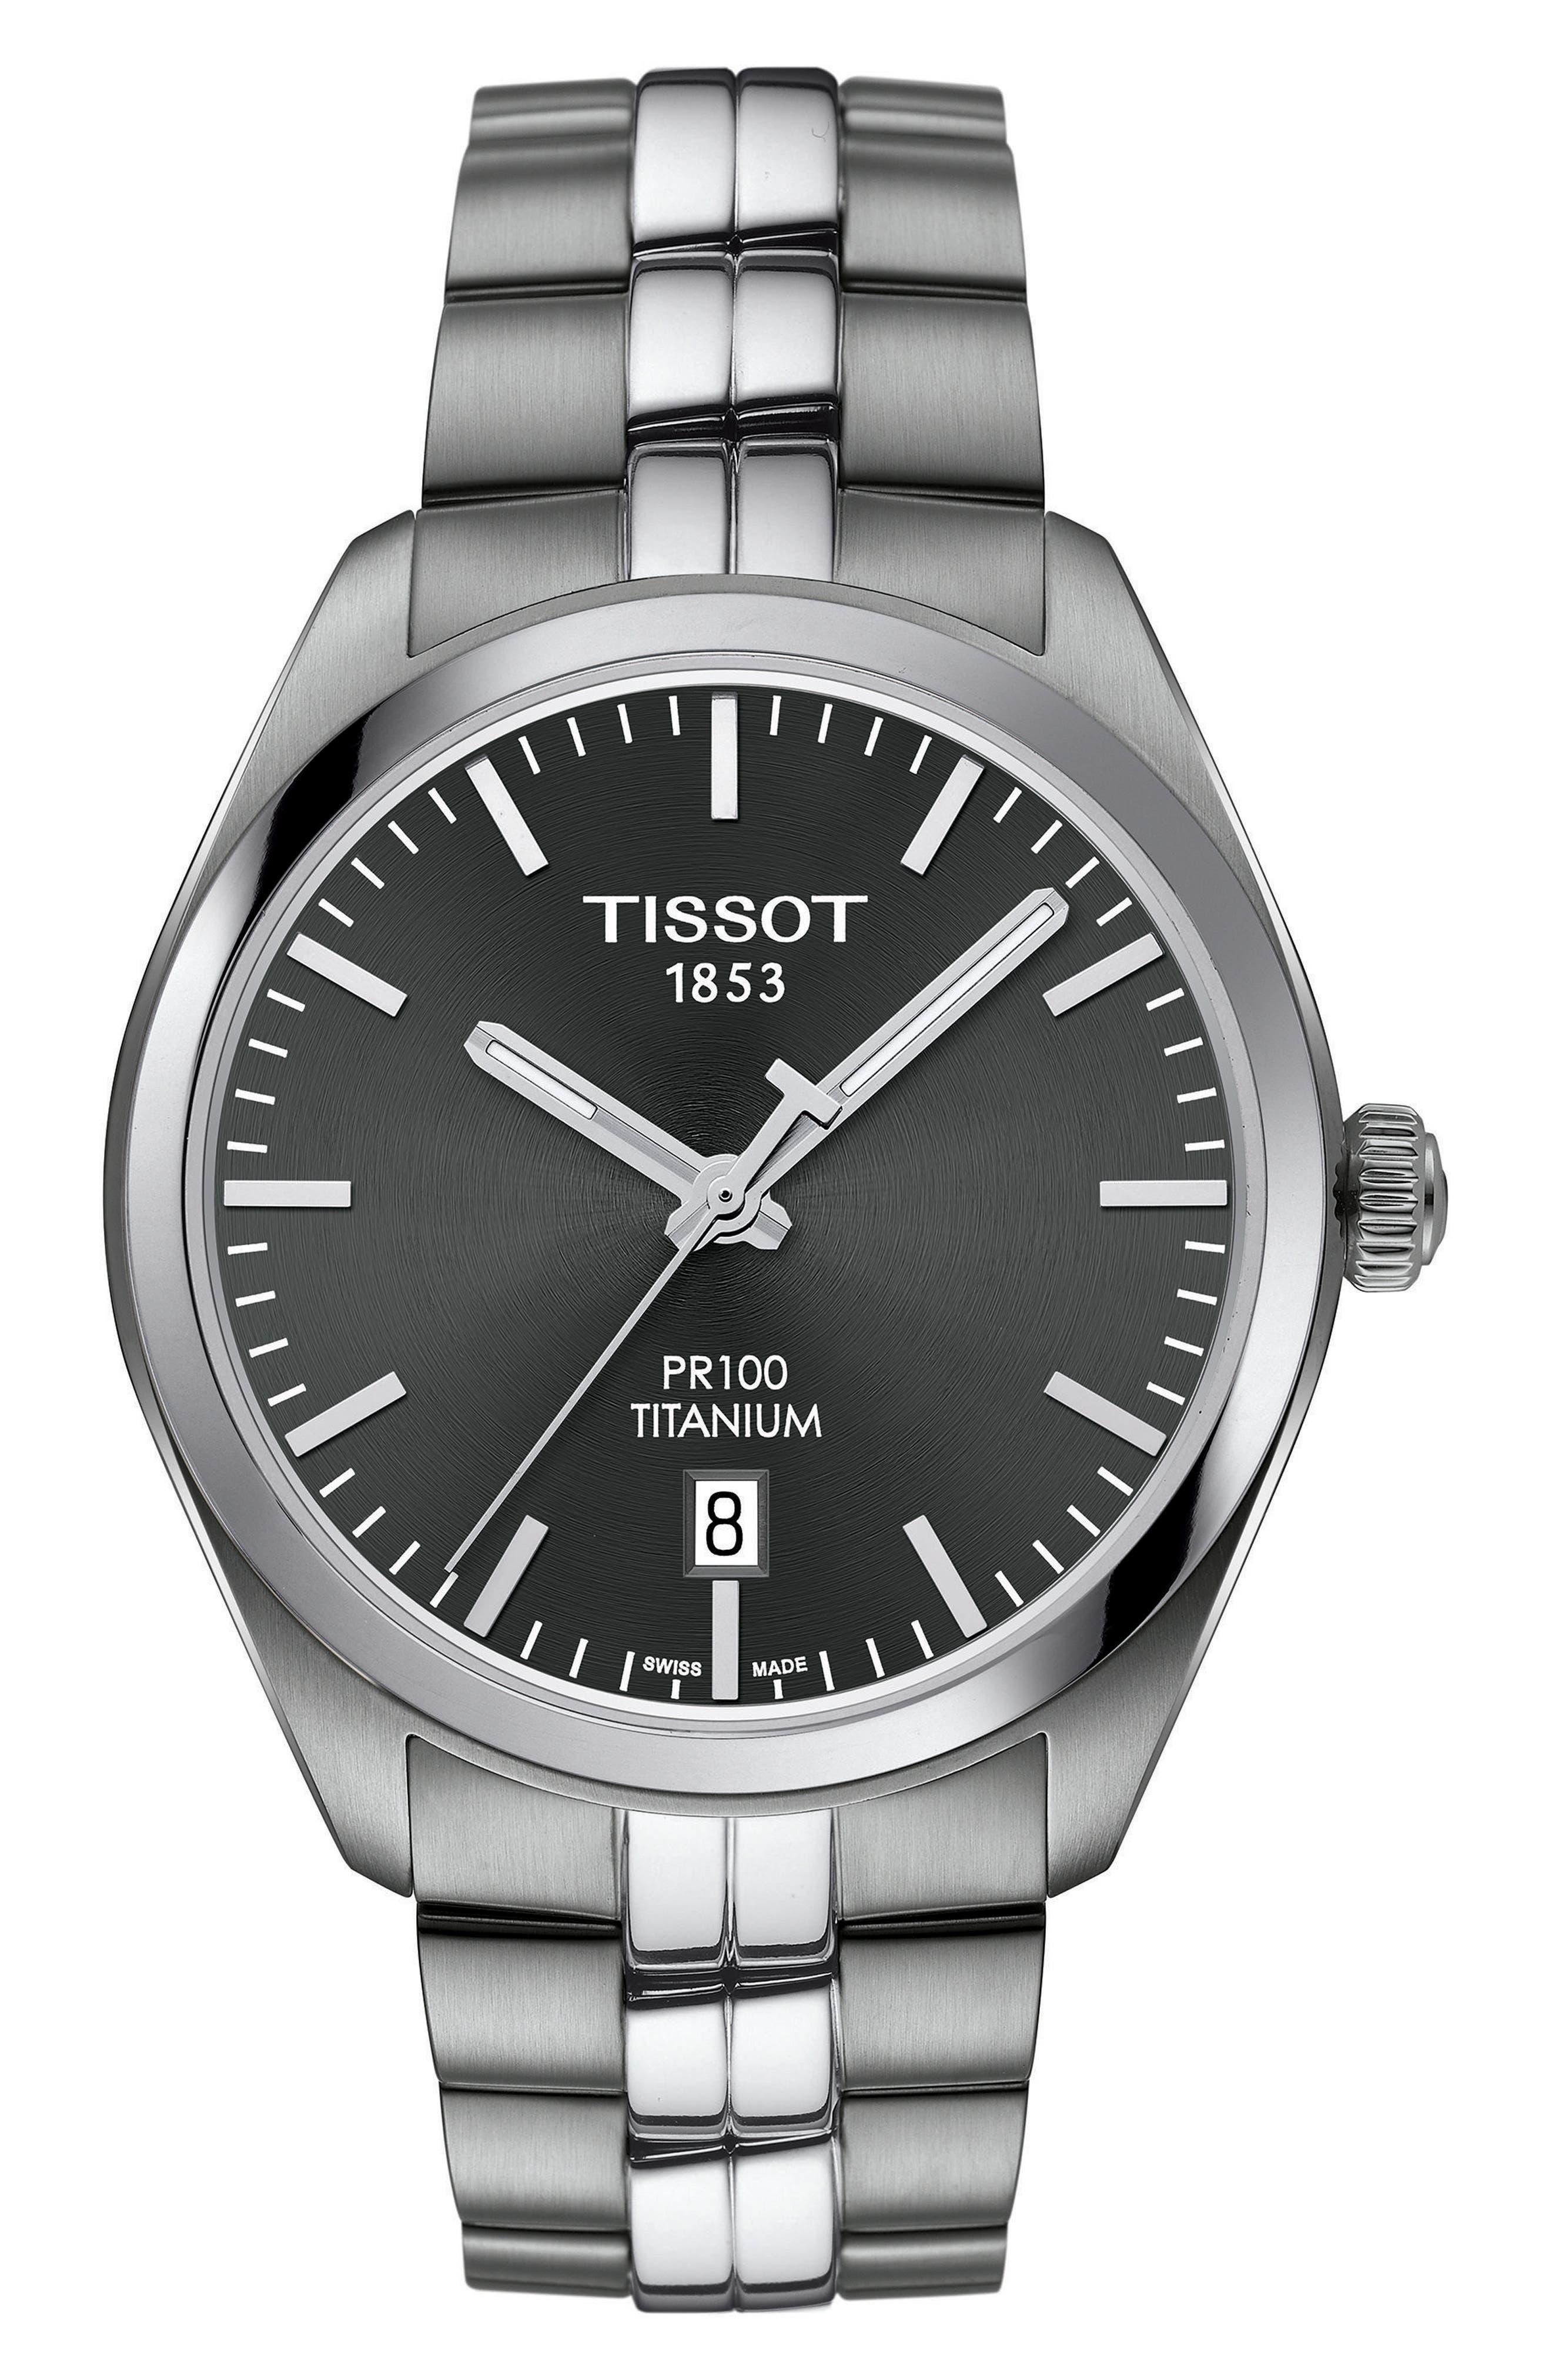 Main Image - Tissot PR100 Titanium Bracelet Watch, 39mm